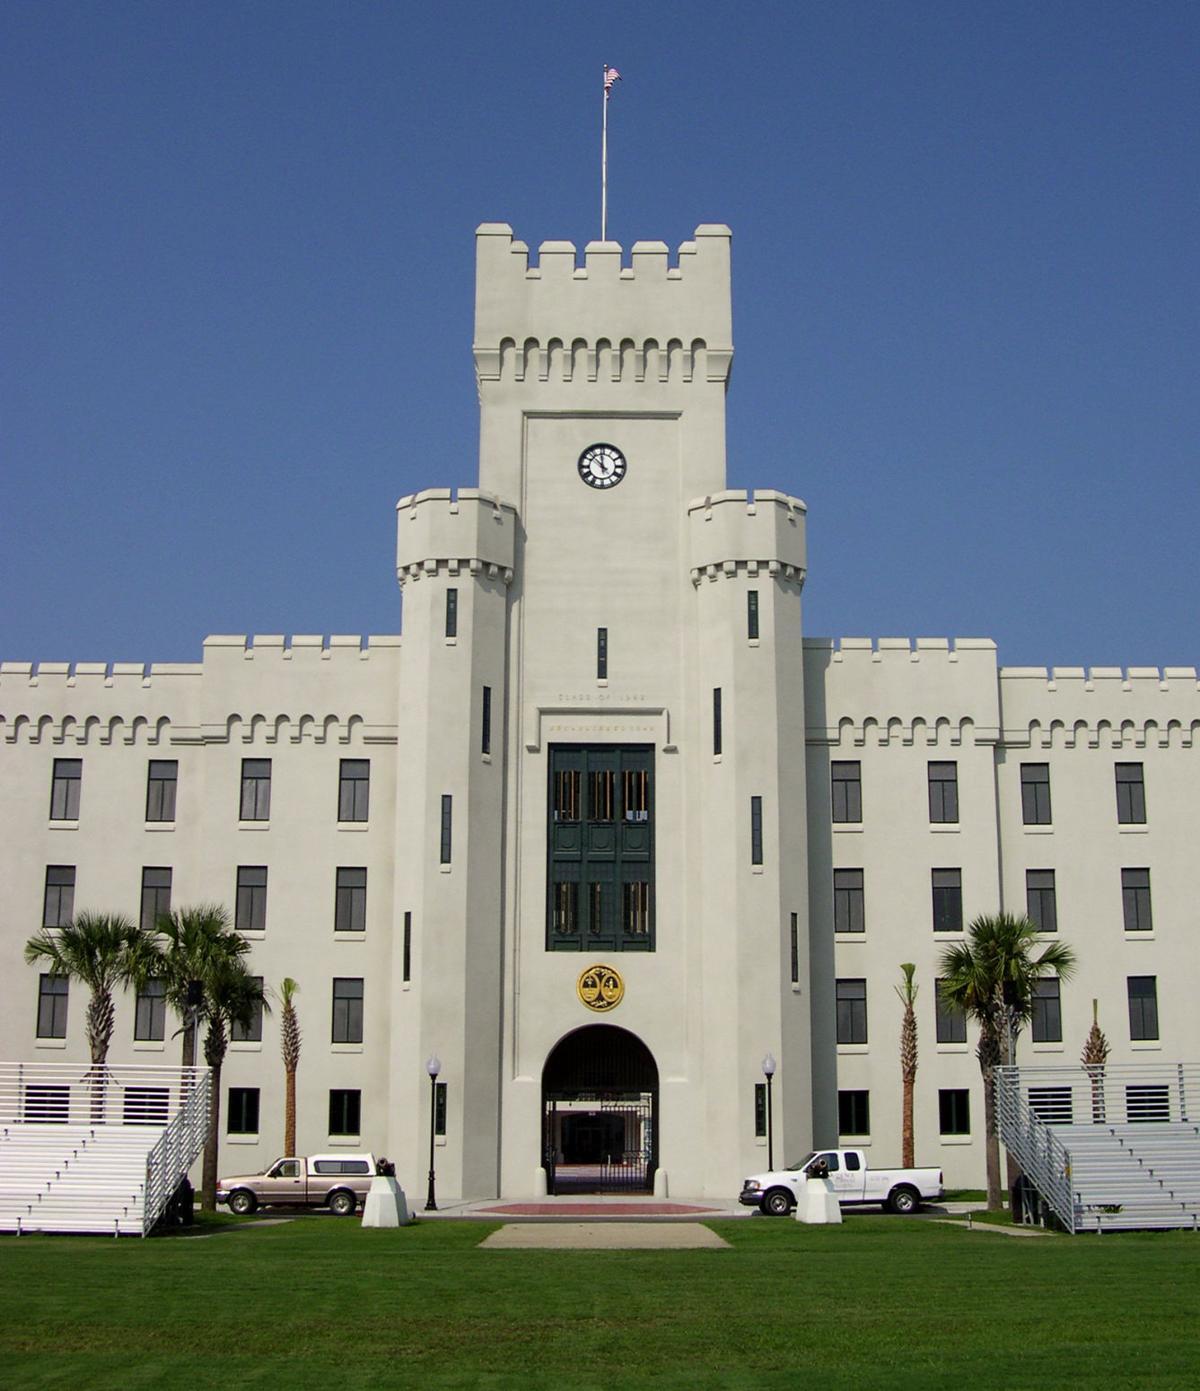 The Citadel Padgett-Thomas Barracks